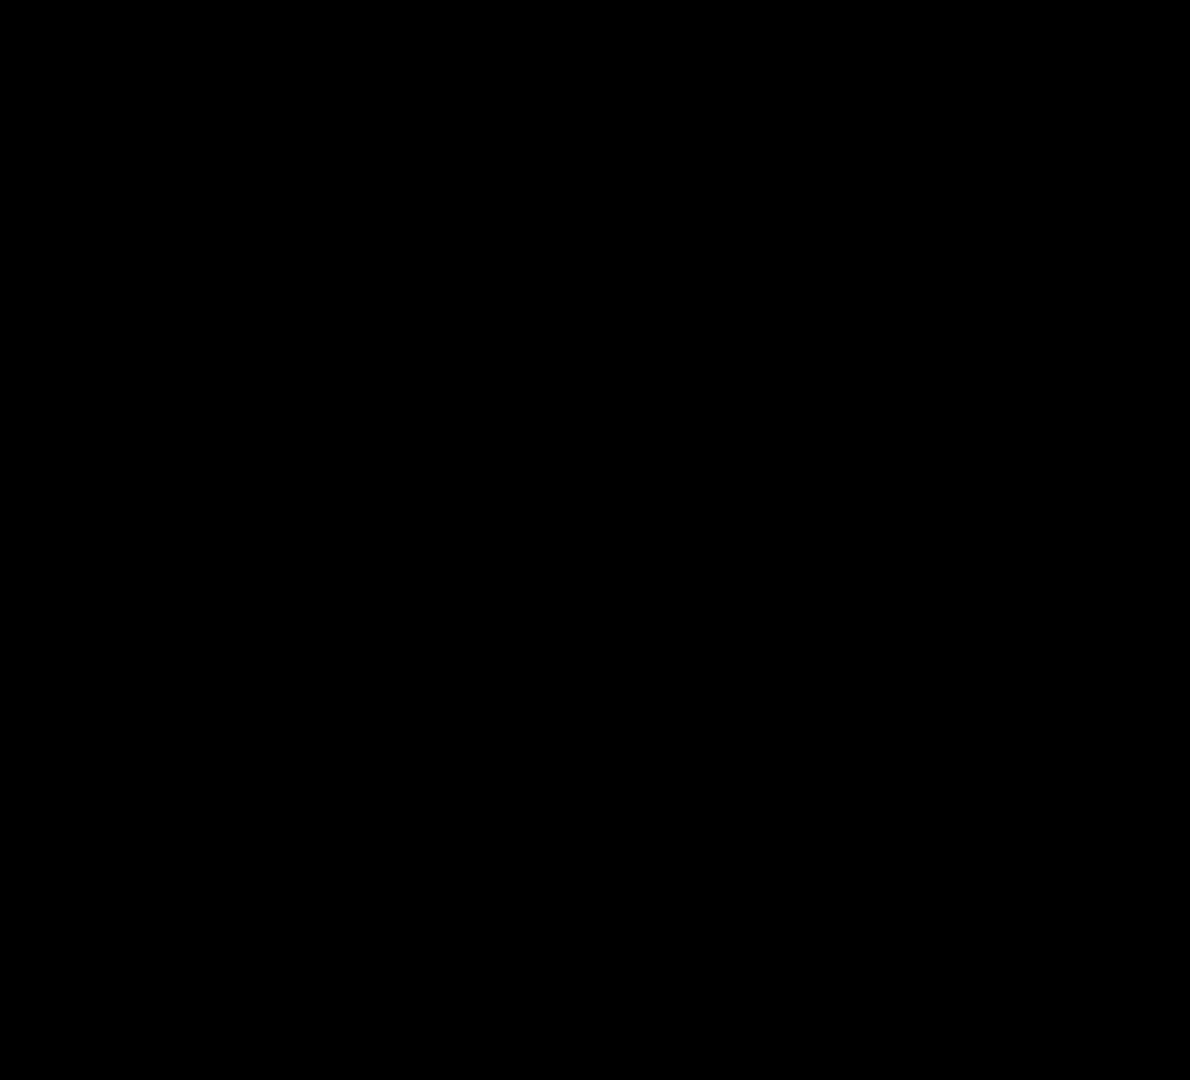 39ce3619a73af8b593f64b1a8bd1884b.png